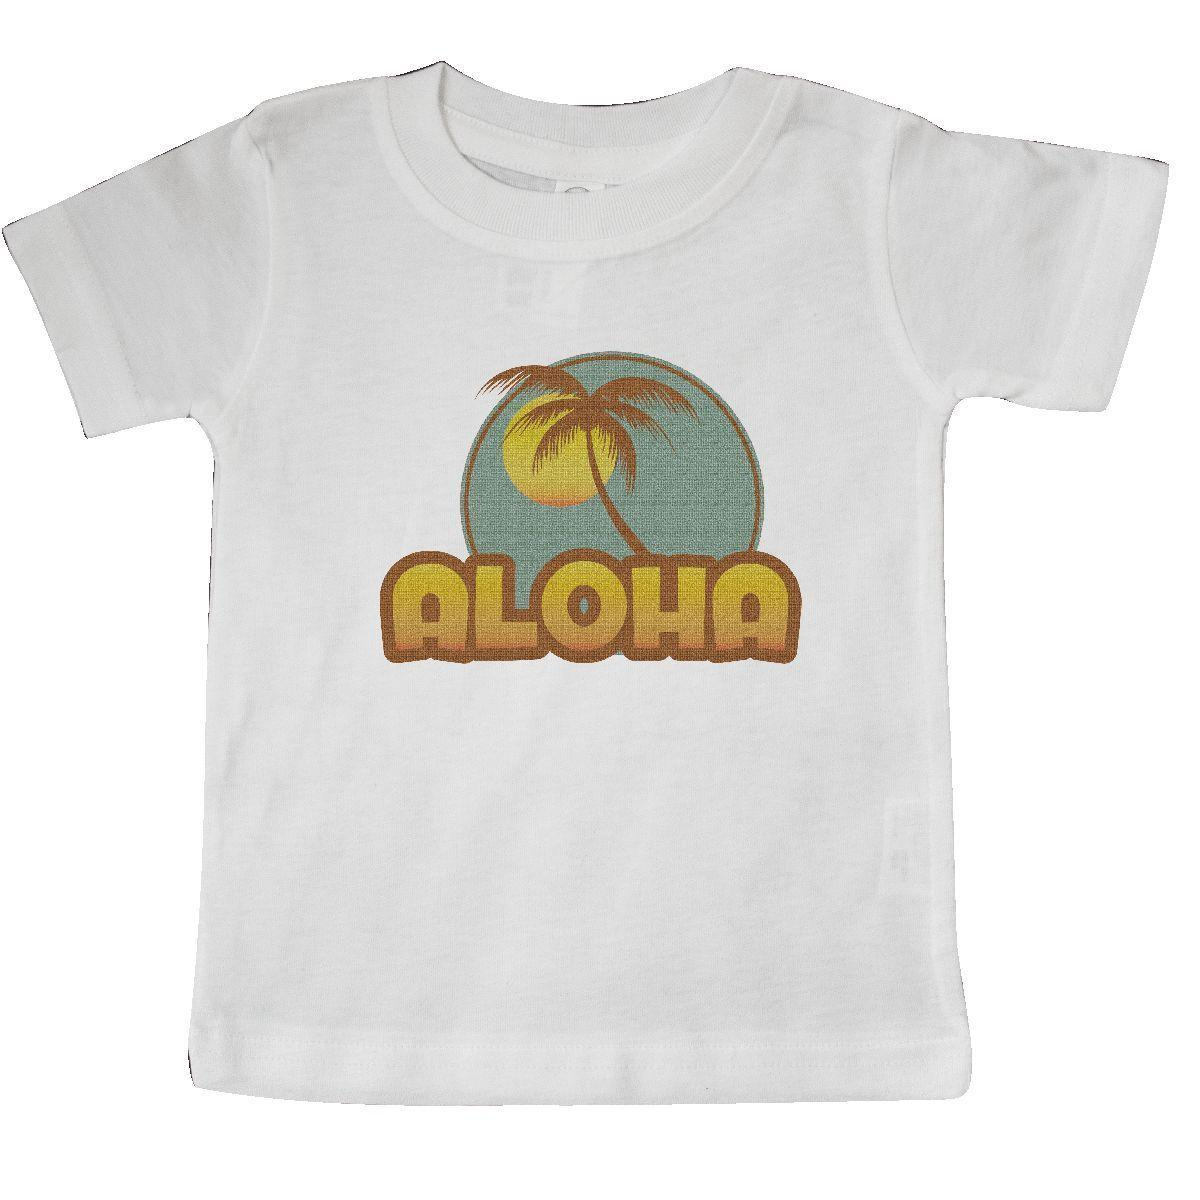 19146b13b Inktastic Aloha Palm Baby T Shirt Hawaii Hula Island Mahalo Maui Tree Beach  Fun Funny Unisex Casual Tee Gift Funny Tee Shirts Mens T Shirt From  Tee_spirit, ...